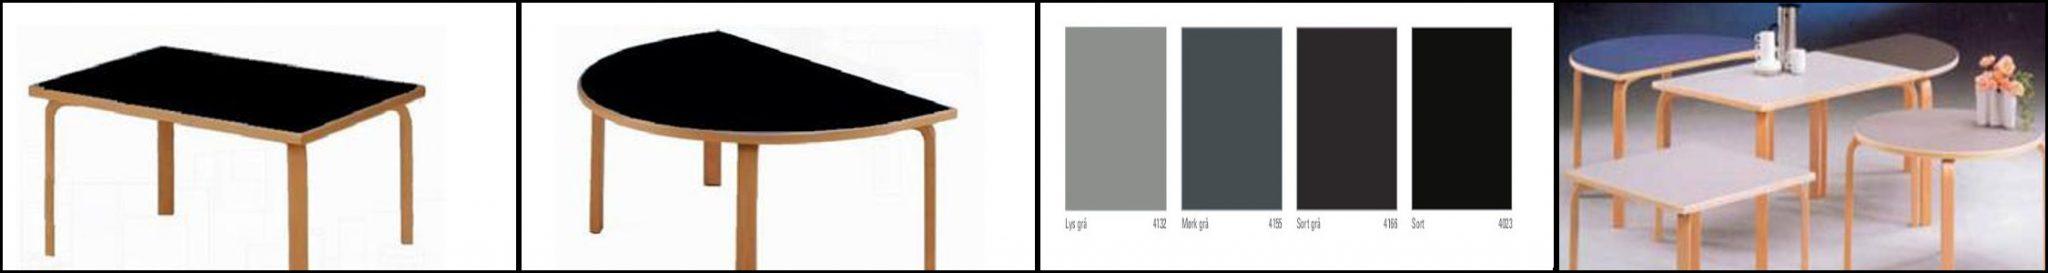 bord i lenoleum